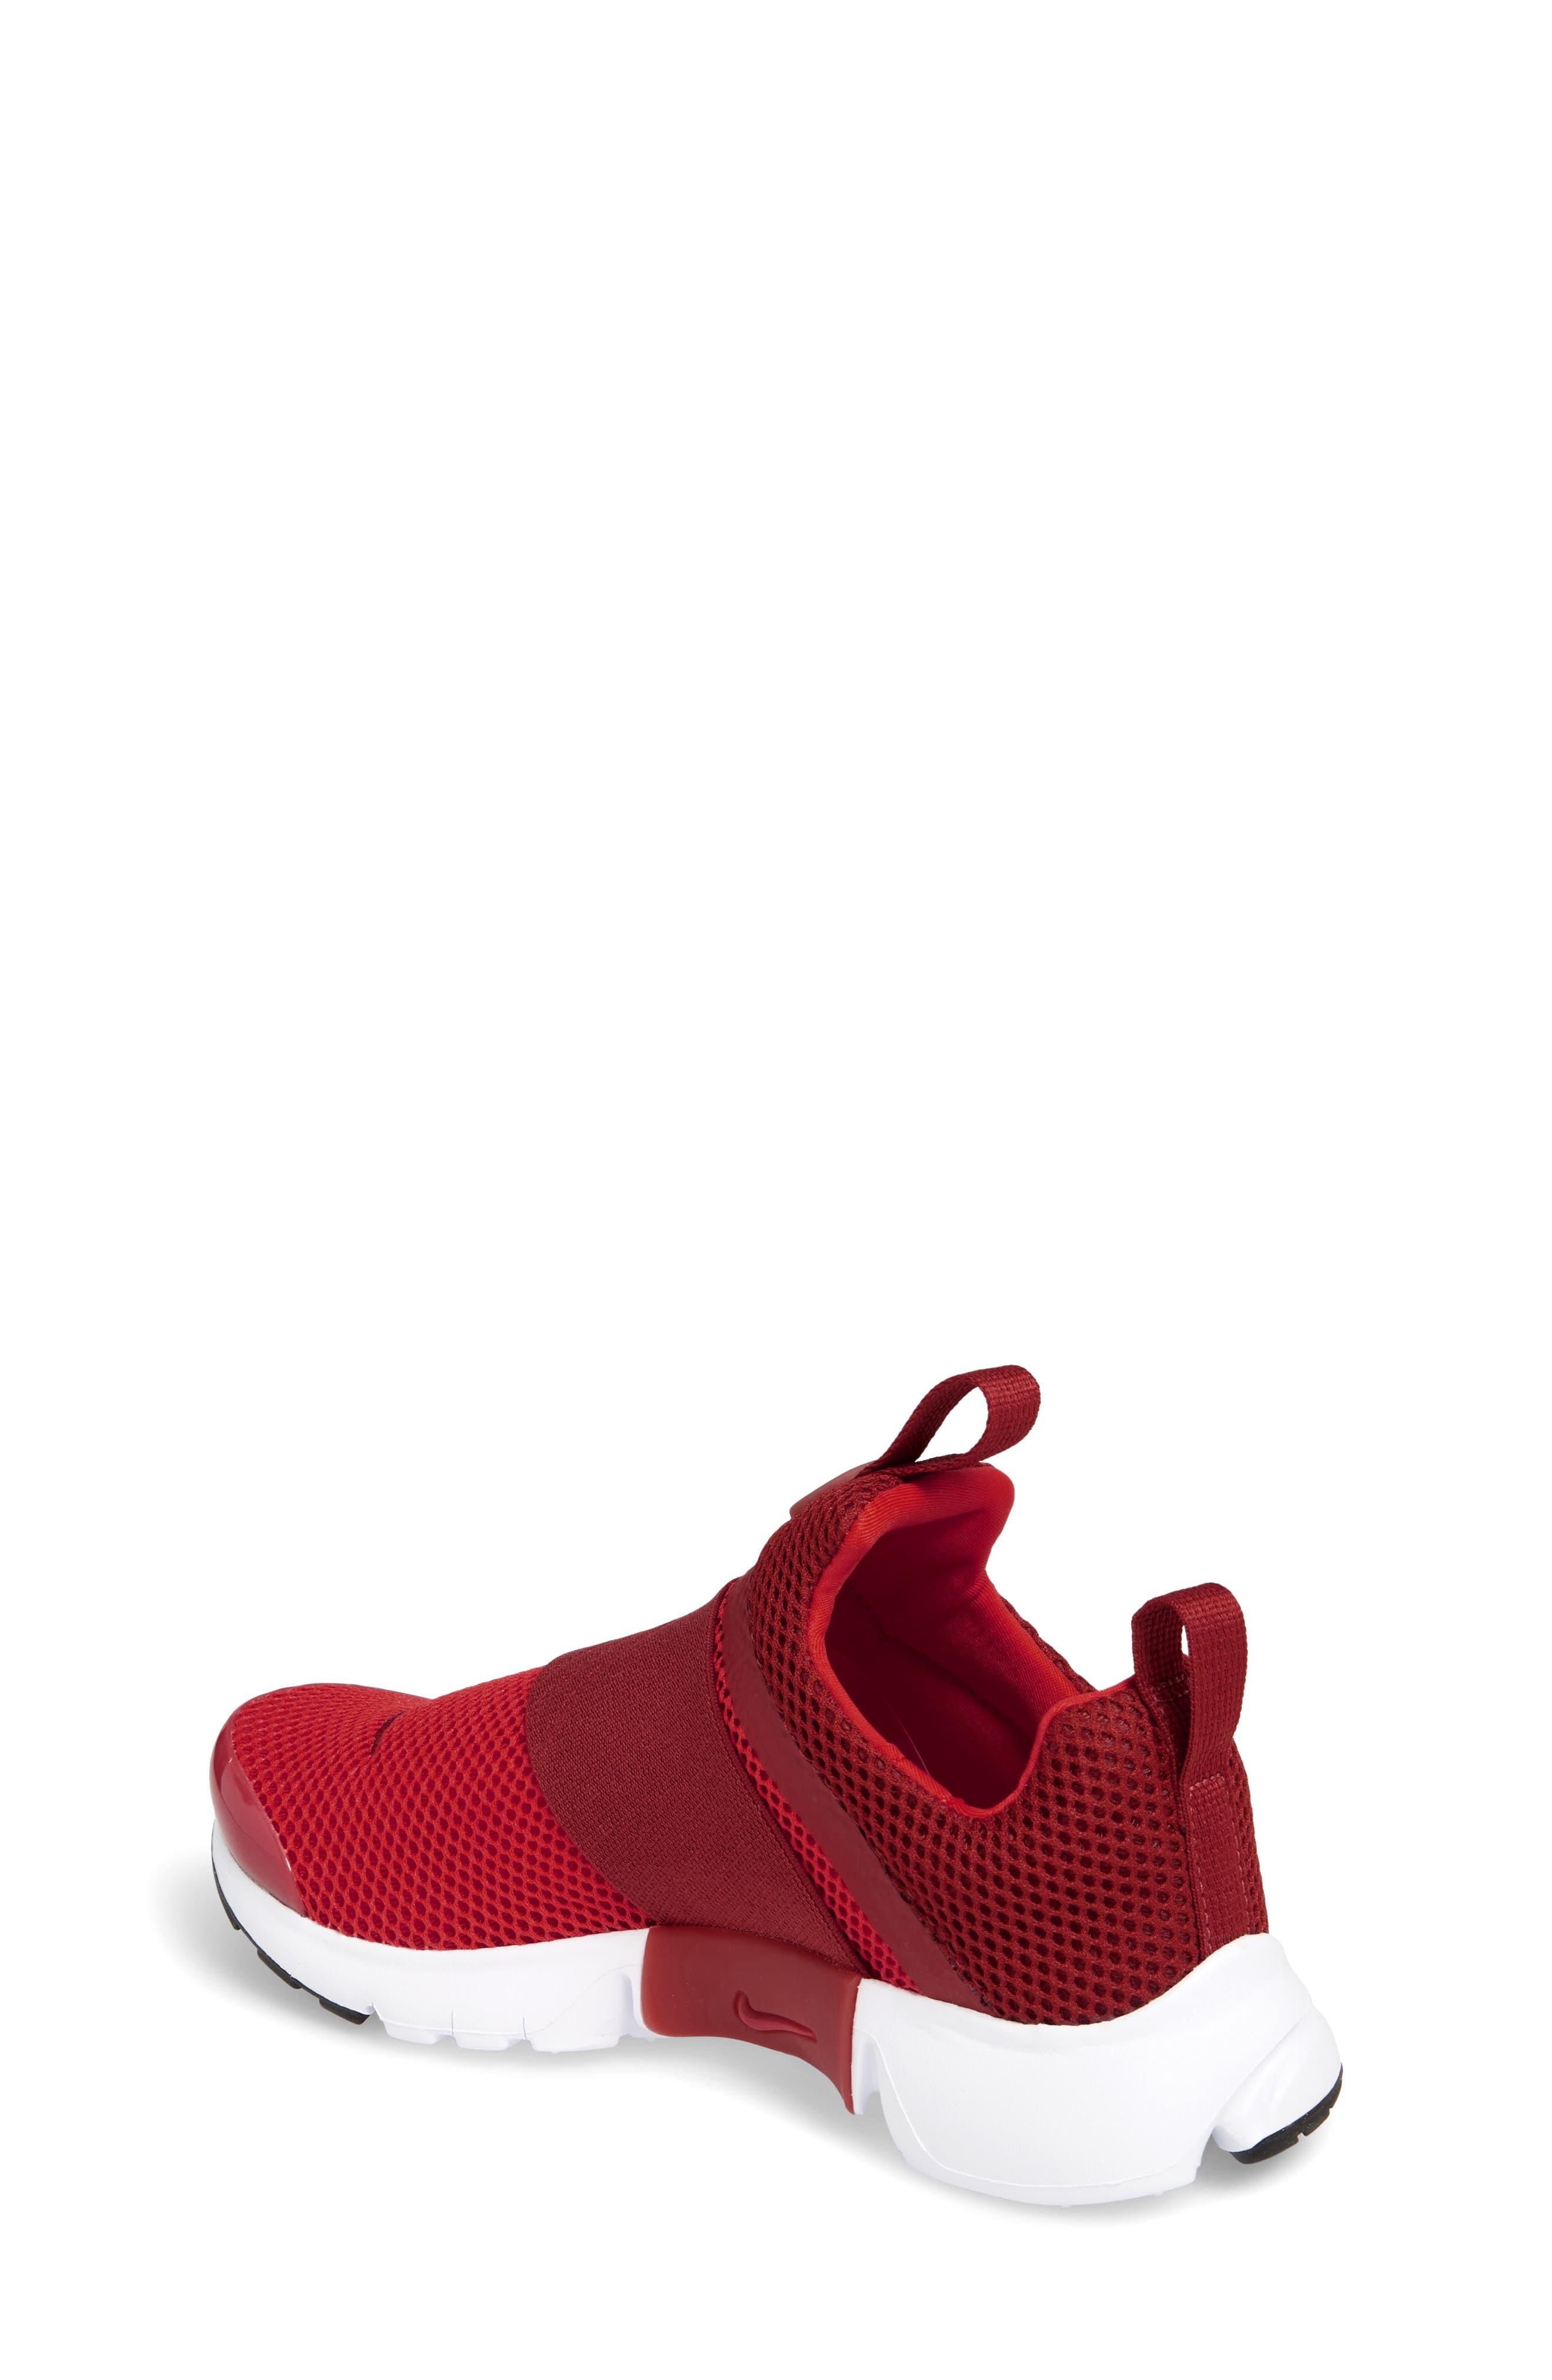 Presto Extreme Sneaker,                             Alternate thumbnail 17, color,